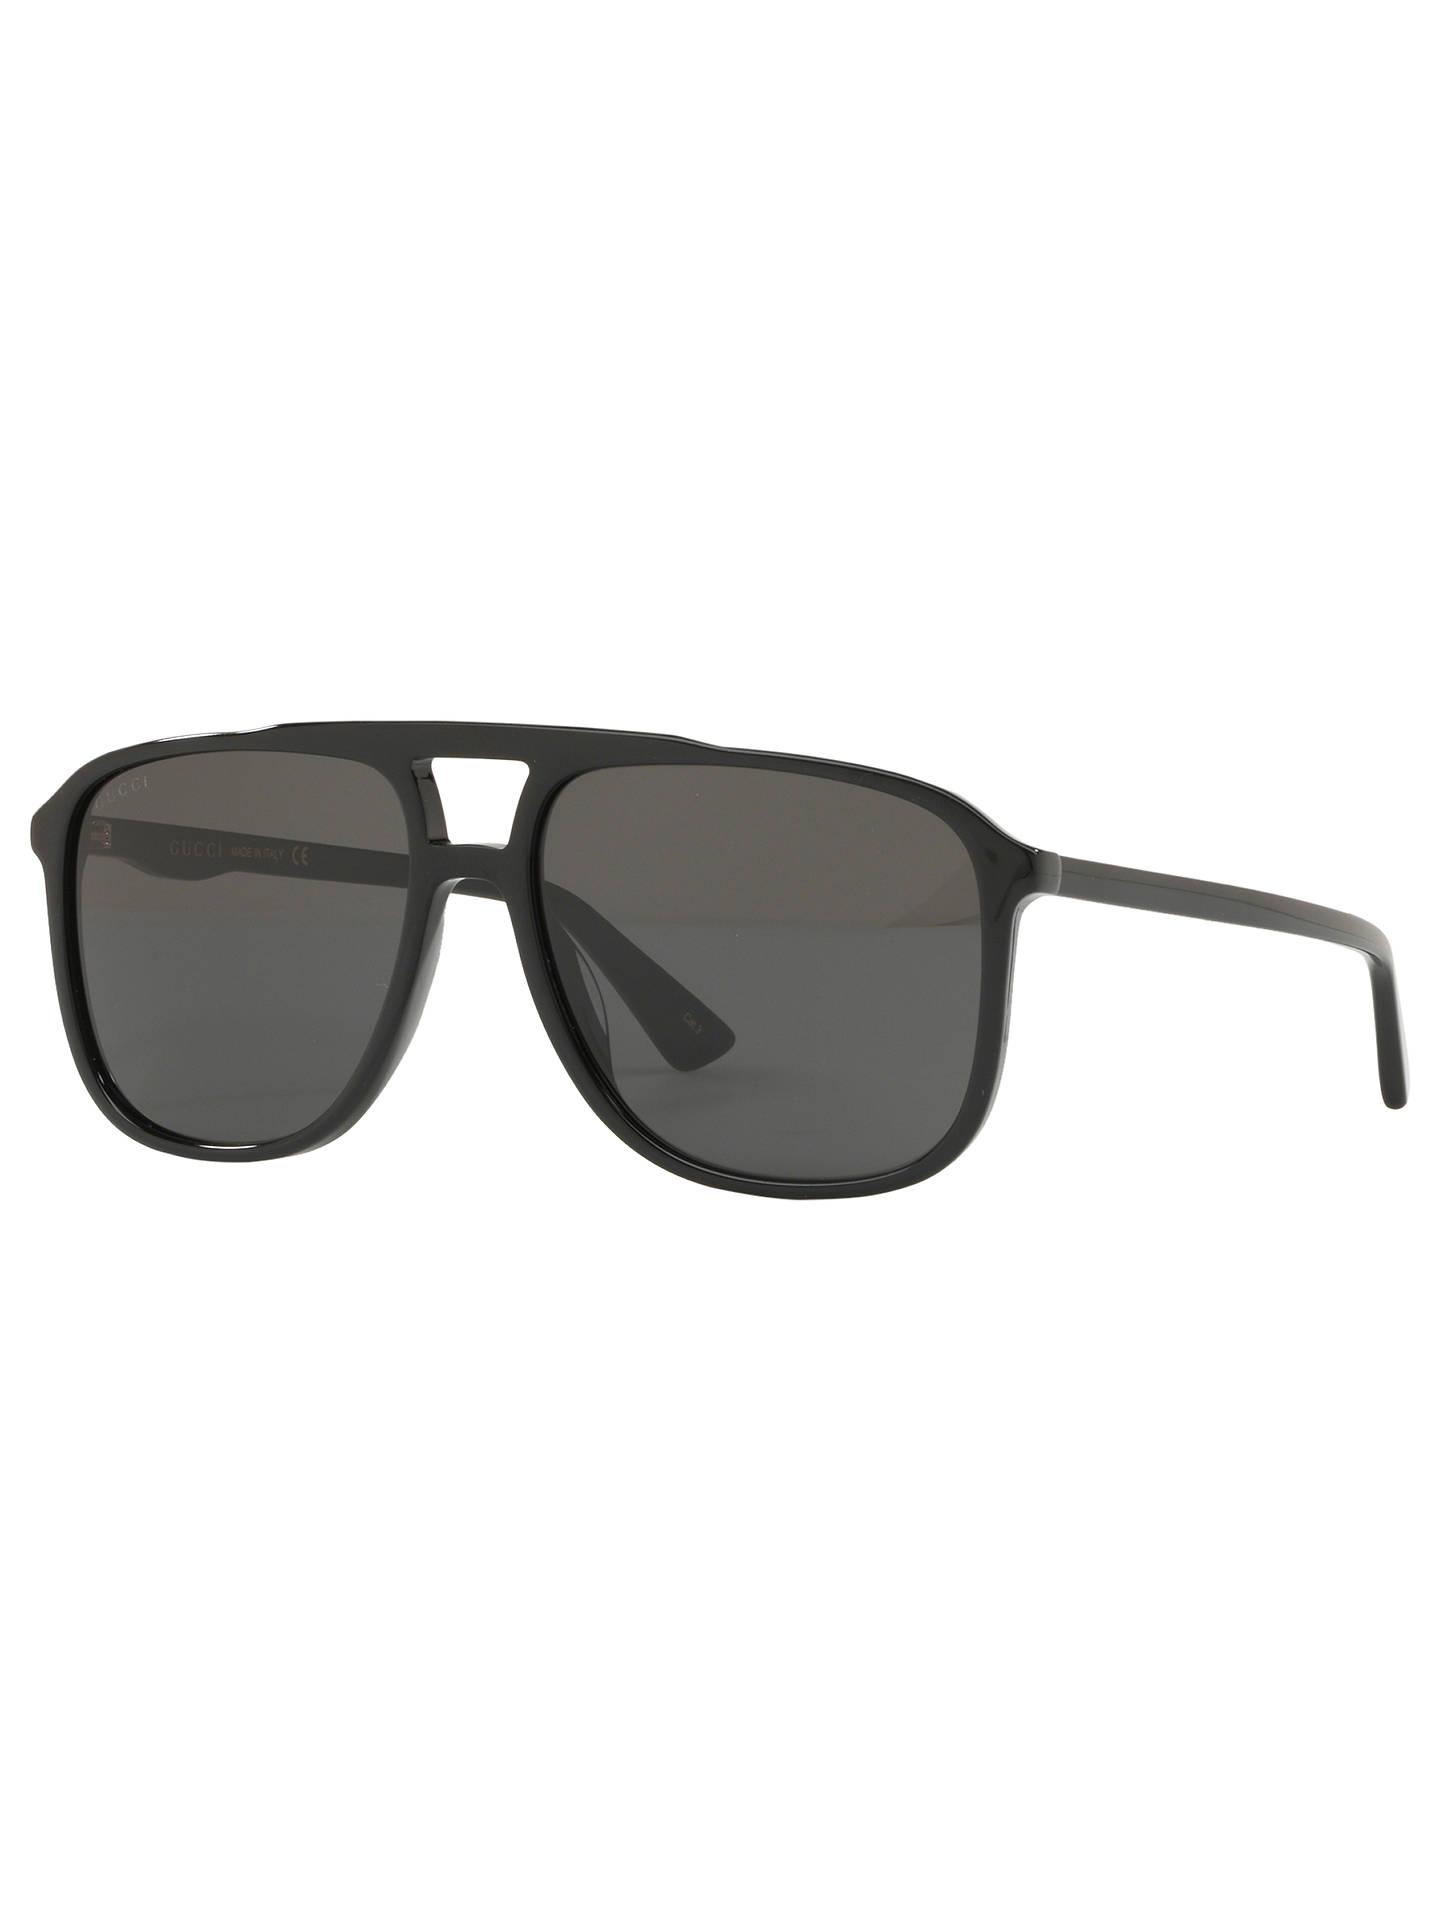 c12e273a4 Buy Gucci GG1053 Women's Square Sunglasses, Black Online at johnlewis. ...